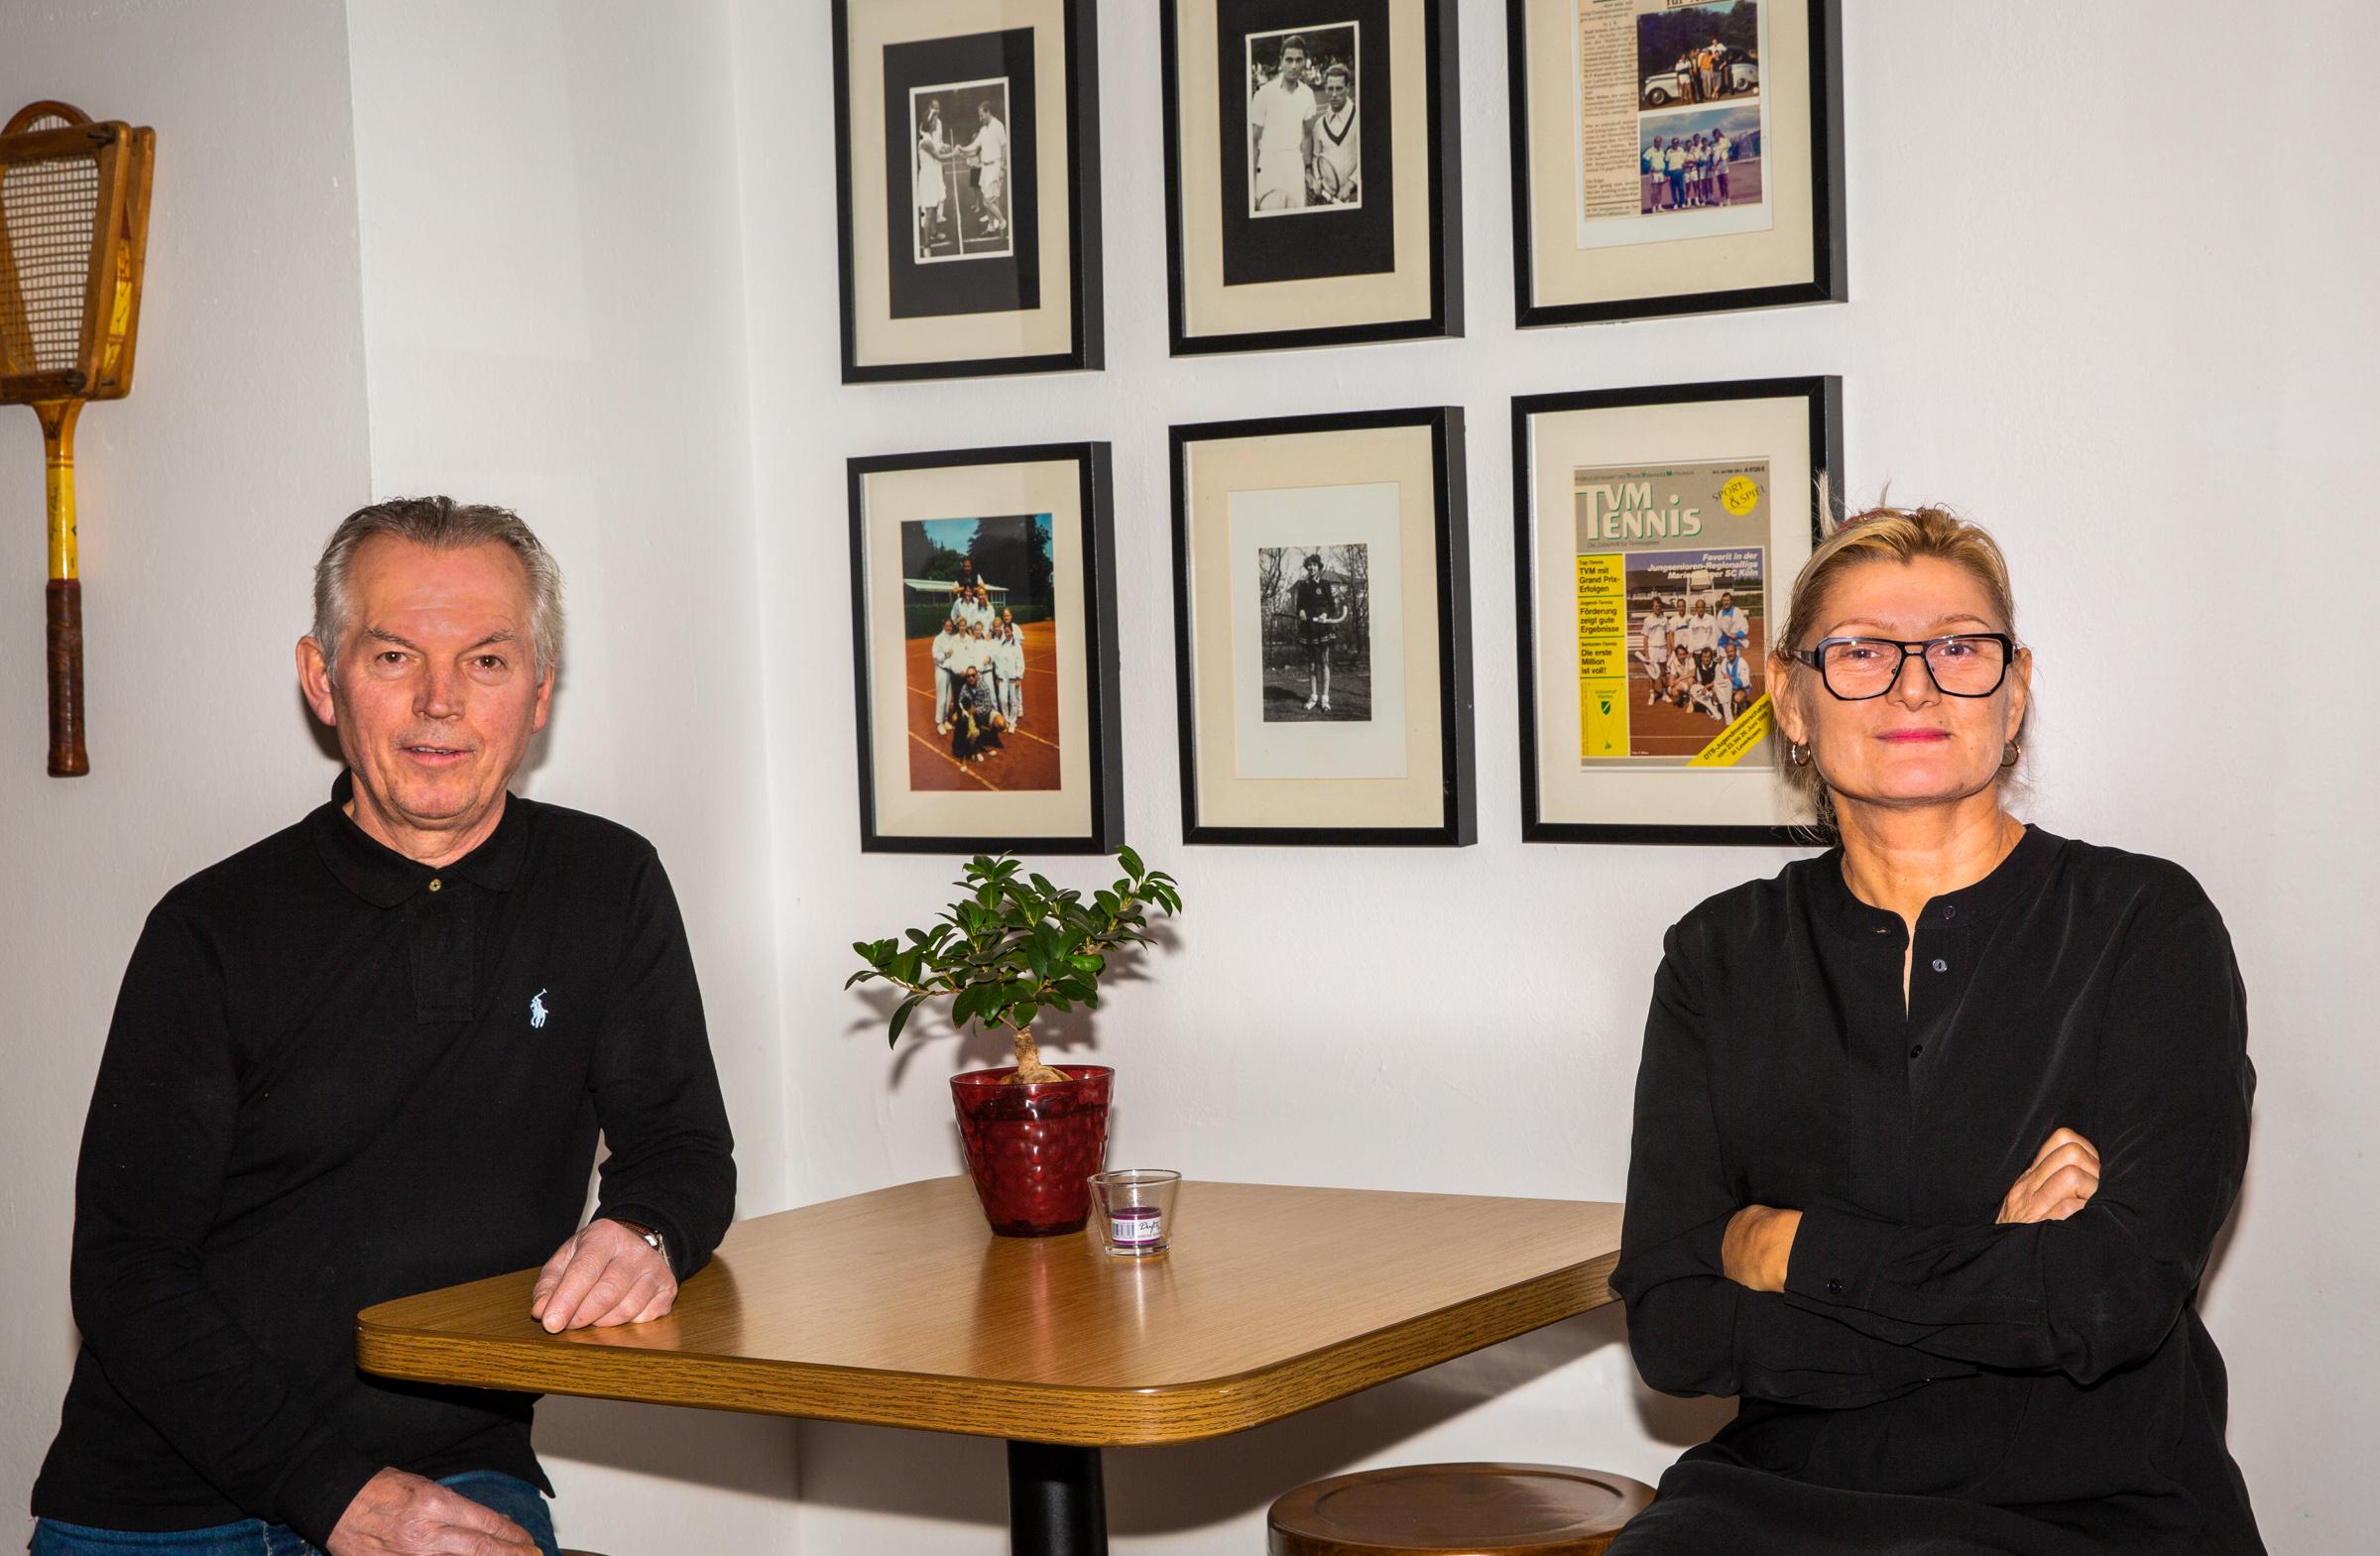 Svetlana Alimpijevic und Zoran Stojnic